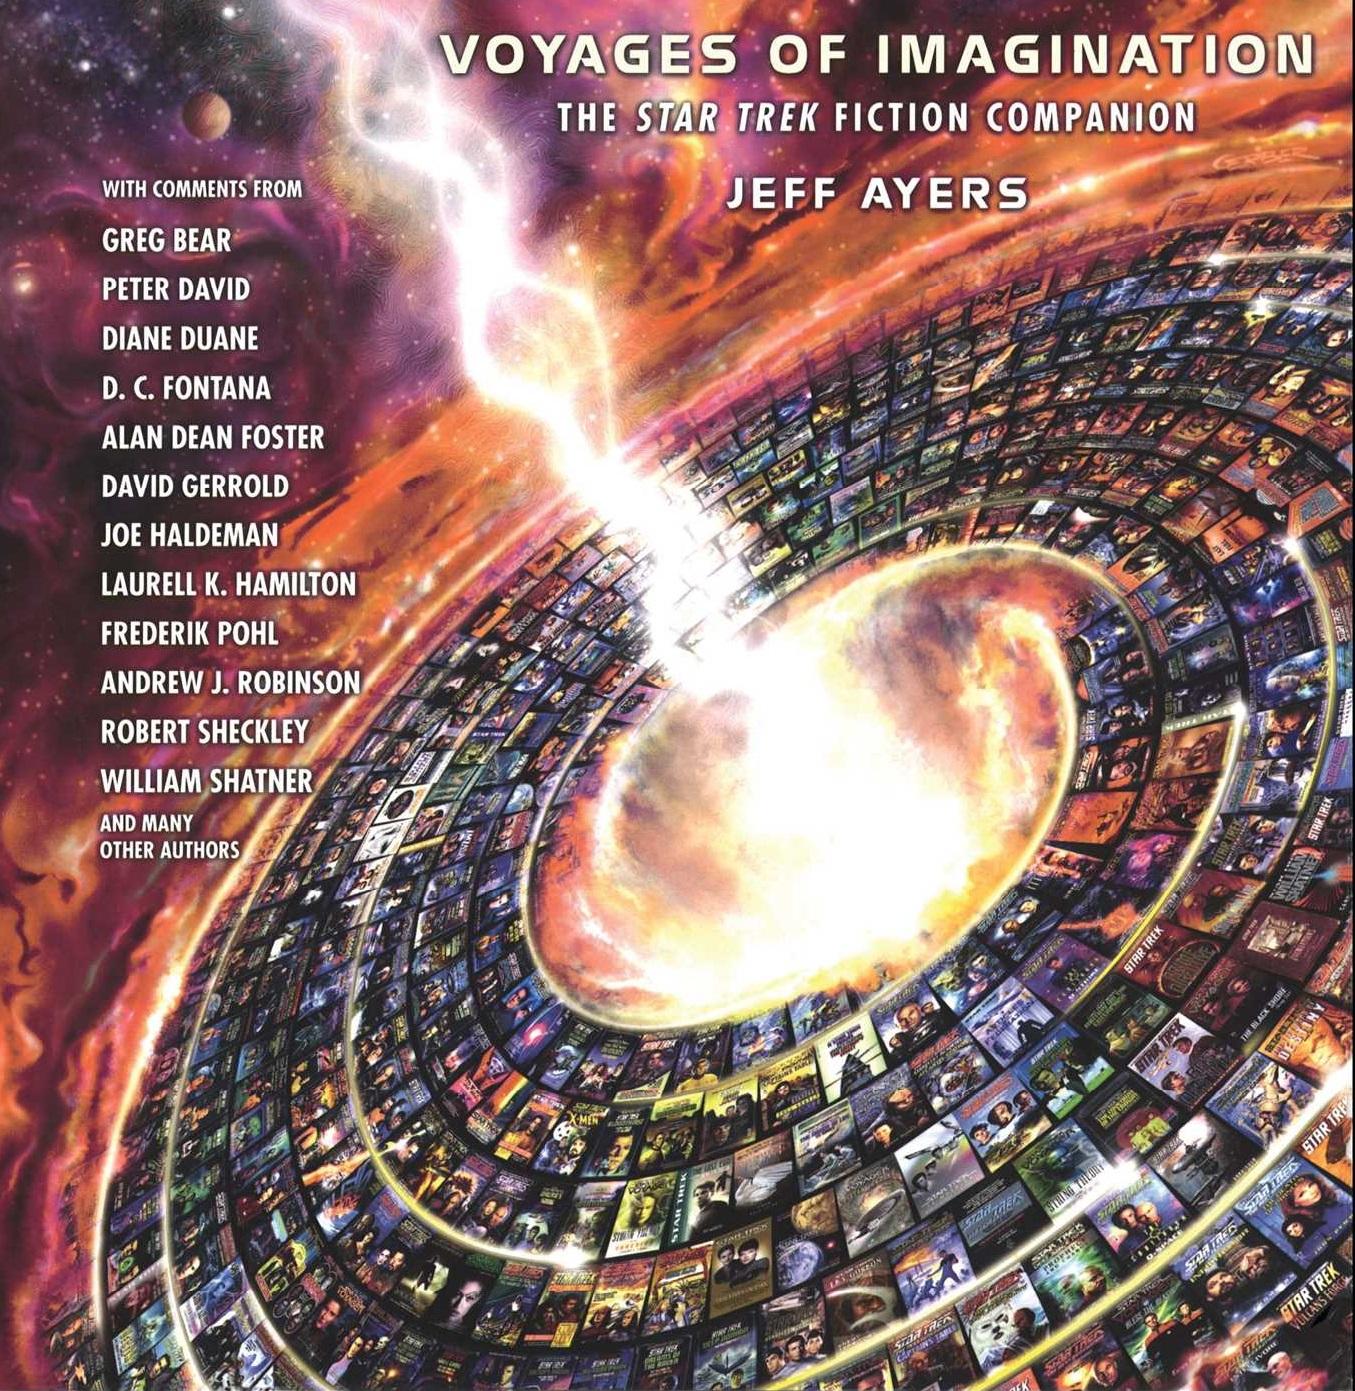 star-trek-voyages-of-imagination-the-star-trek-fiction-companion-articlecover.jpg